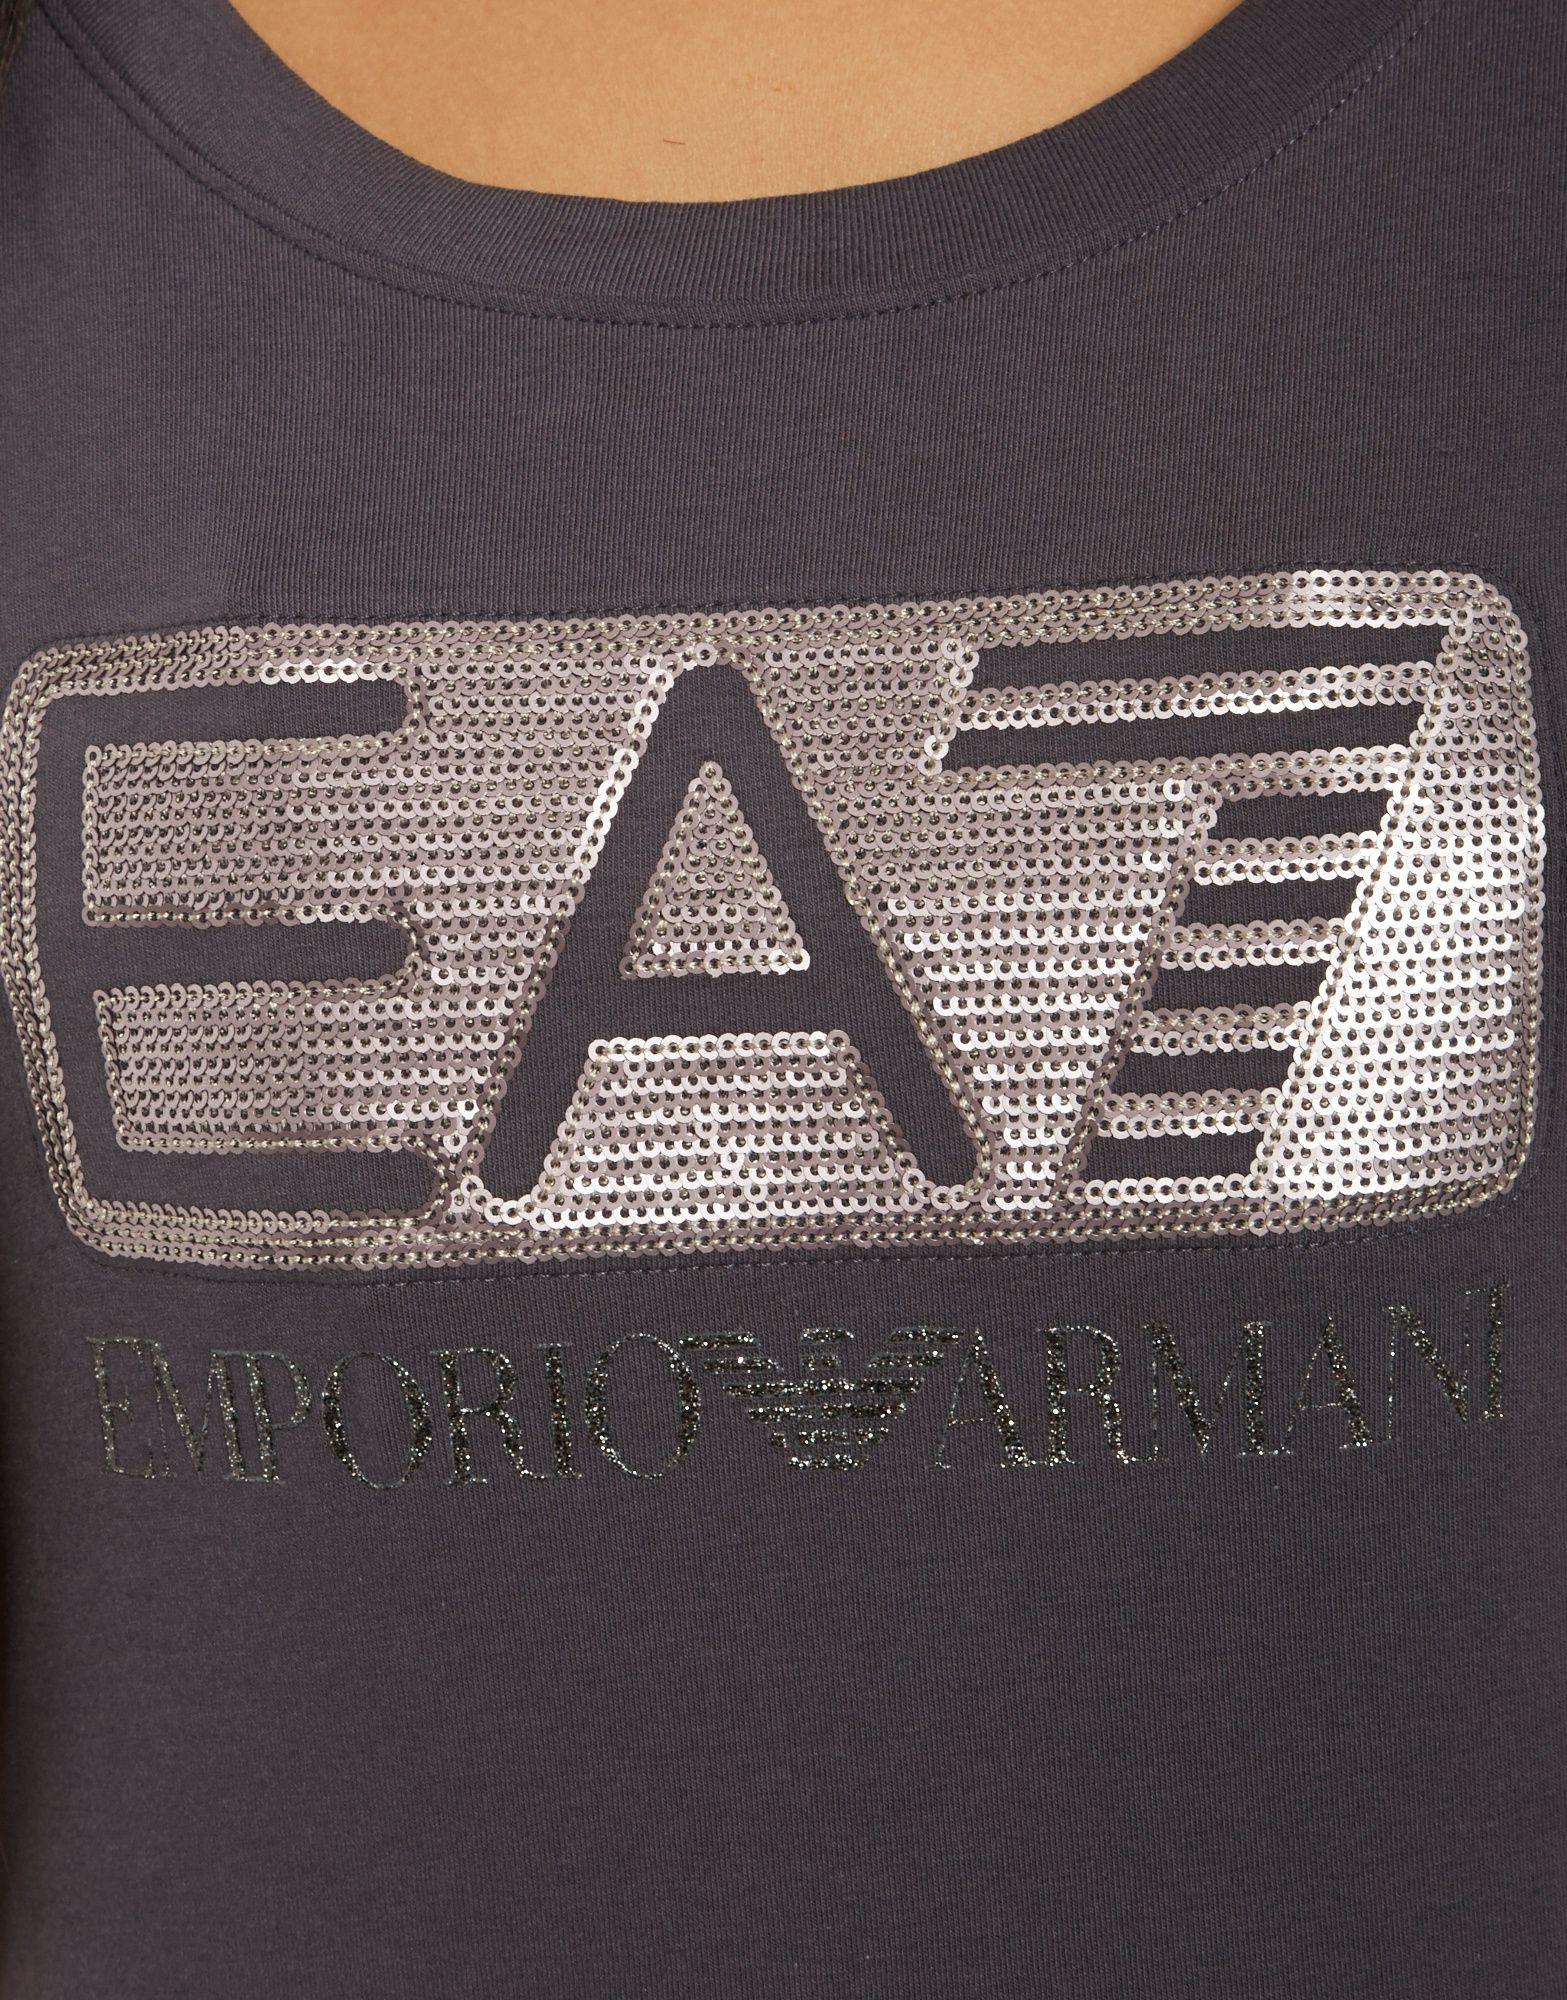 Emporio Armani EA7 Graphic Sequins T-Shirt